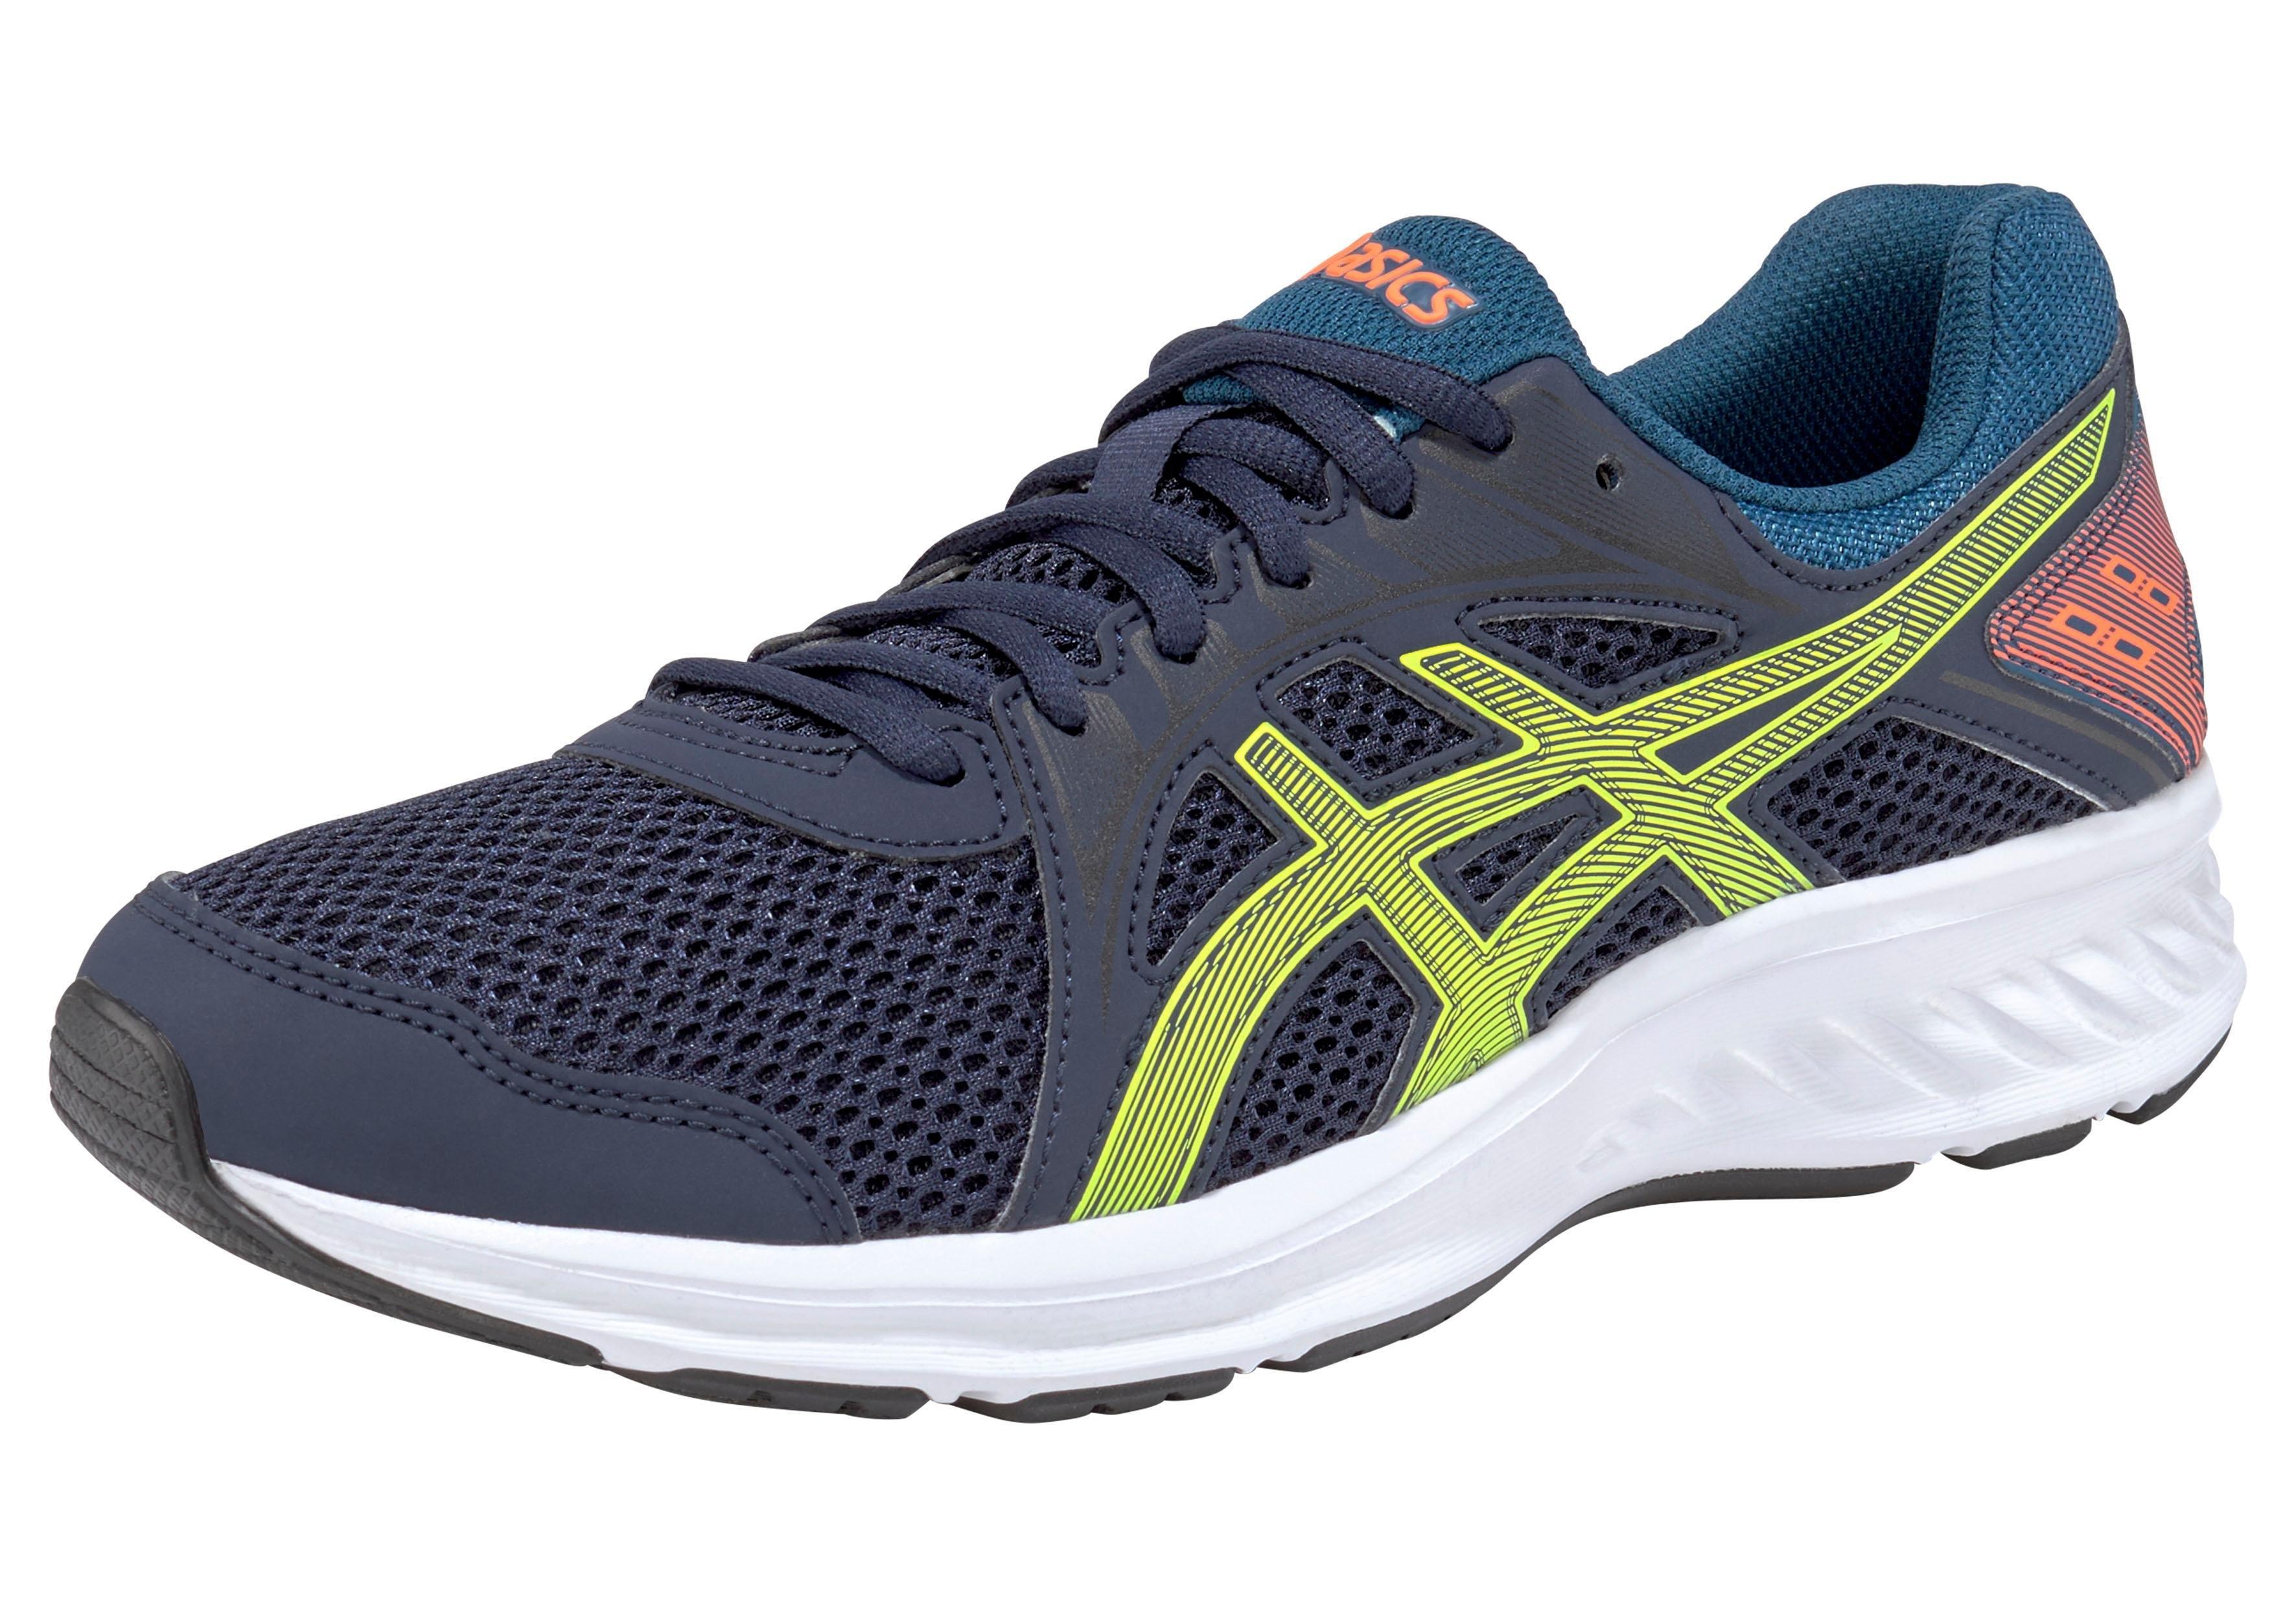 asics runningschoenen »Jolt 2« nu online kopen bij OTTO